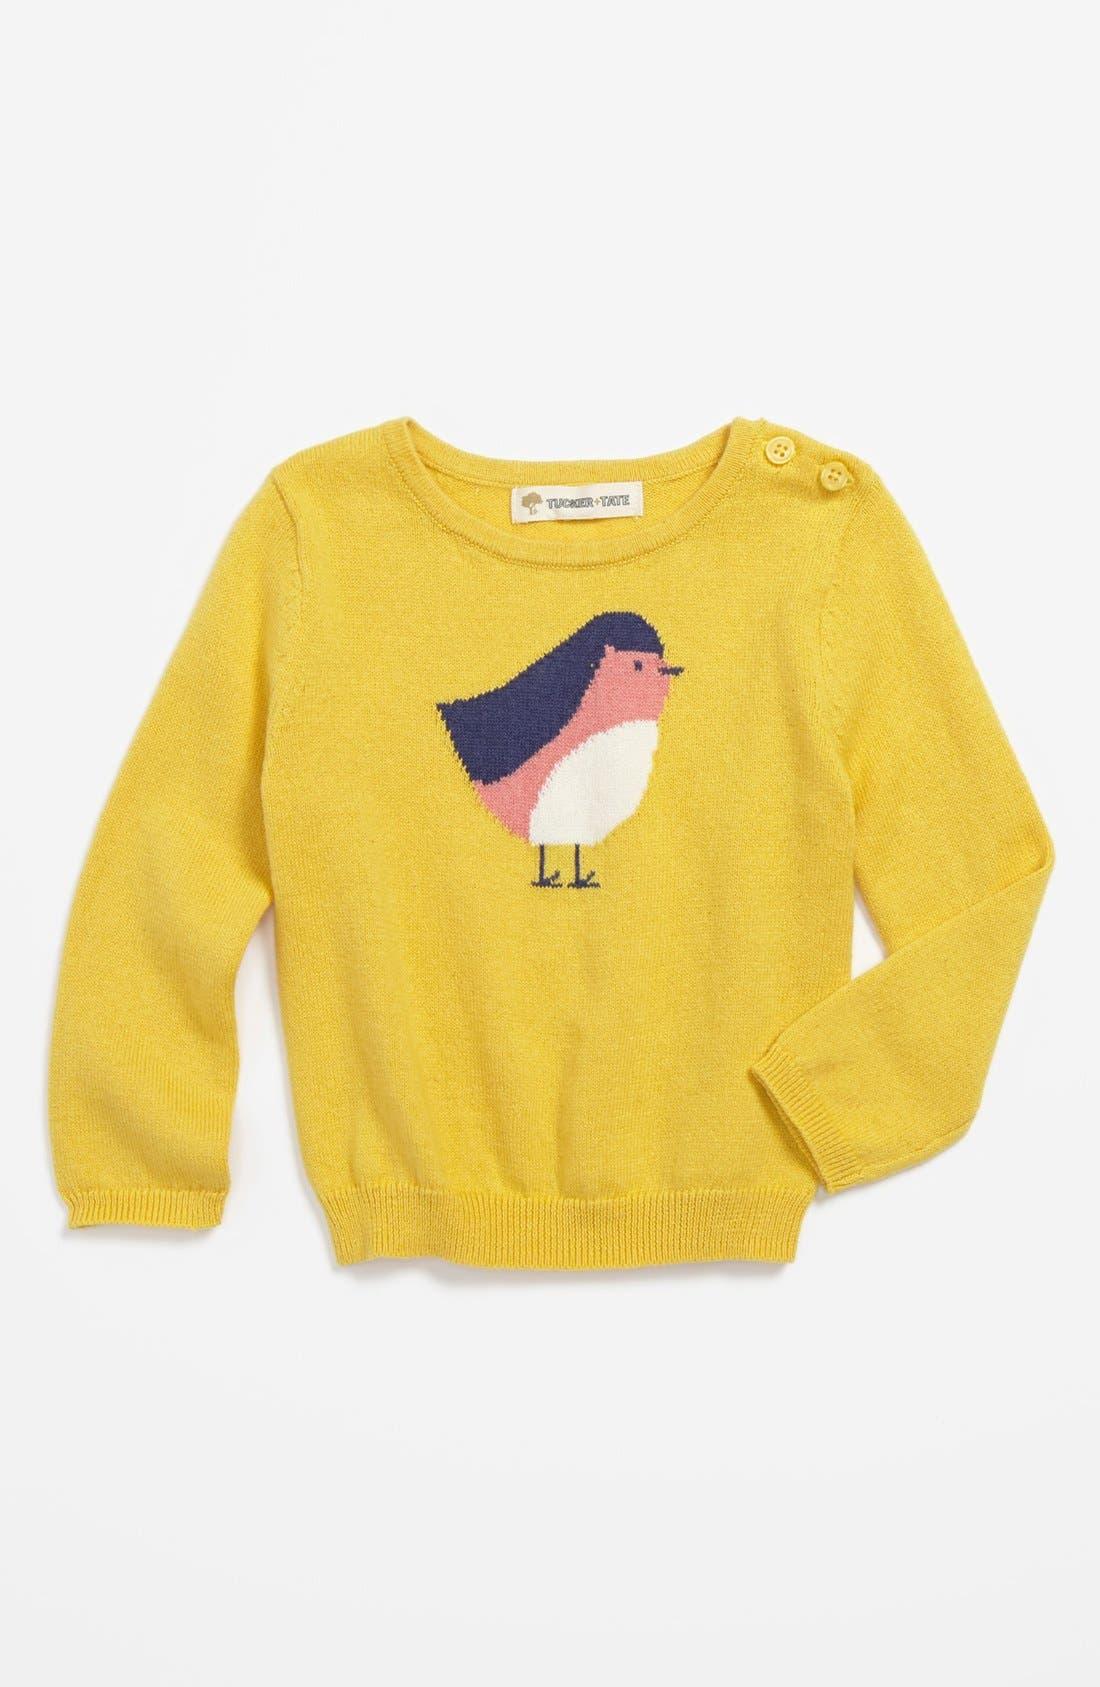 Alternate Image 1 Selected - Tucker + Tate 'Alexa' Intarsia Sweater (Baby Girls)